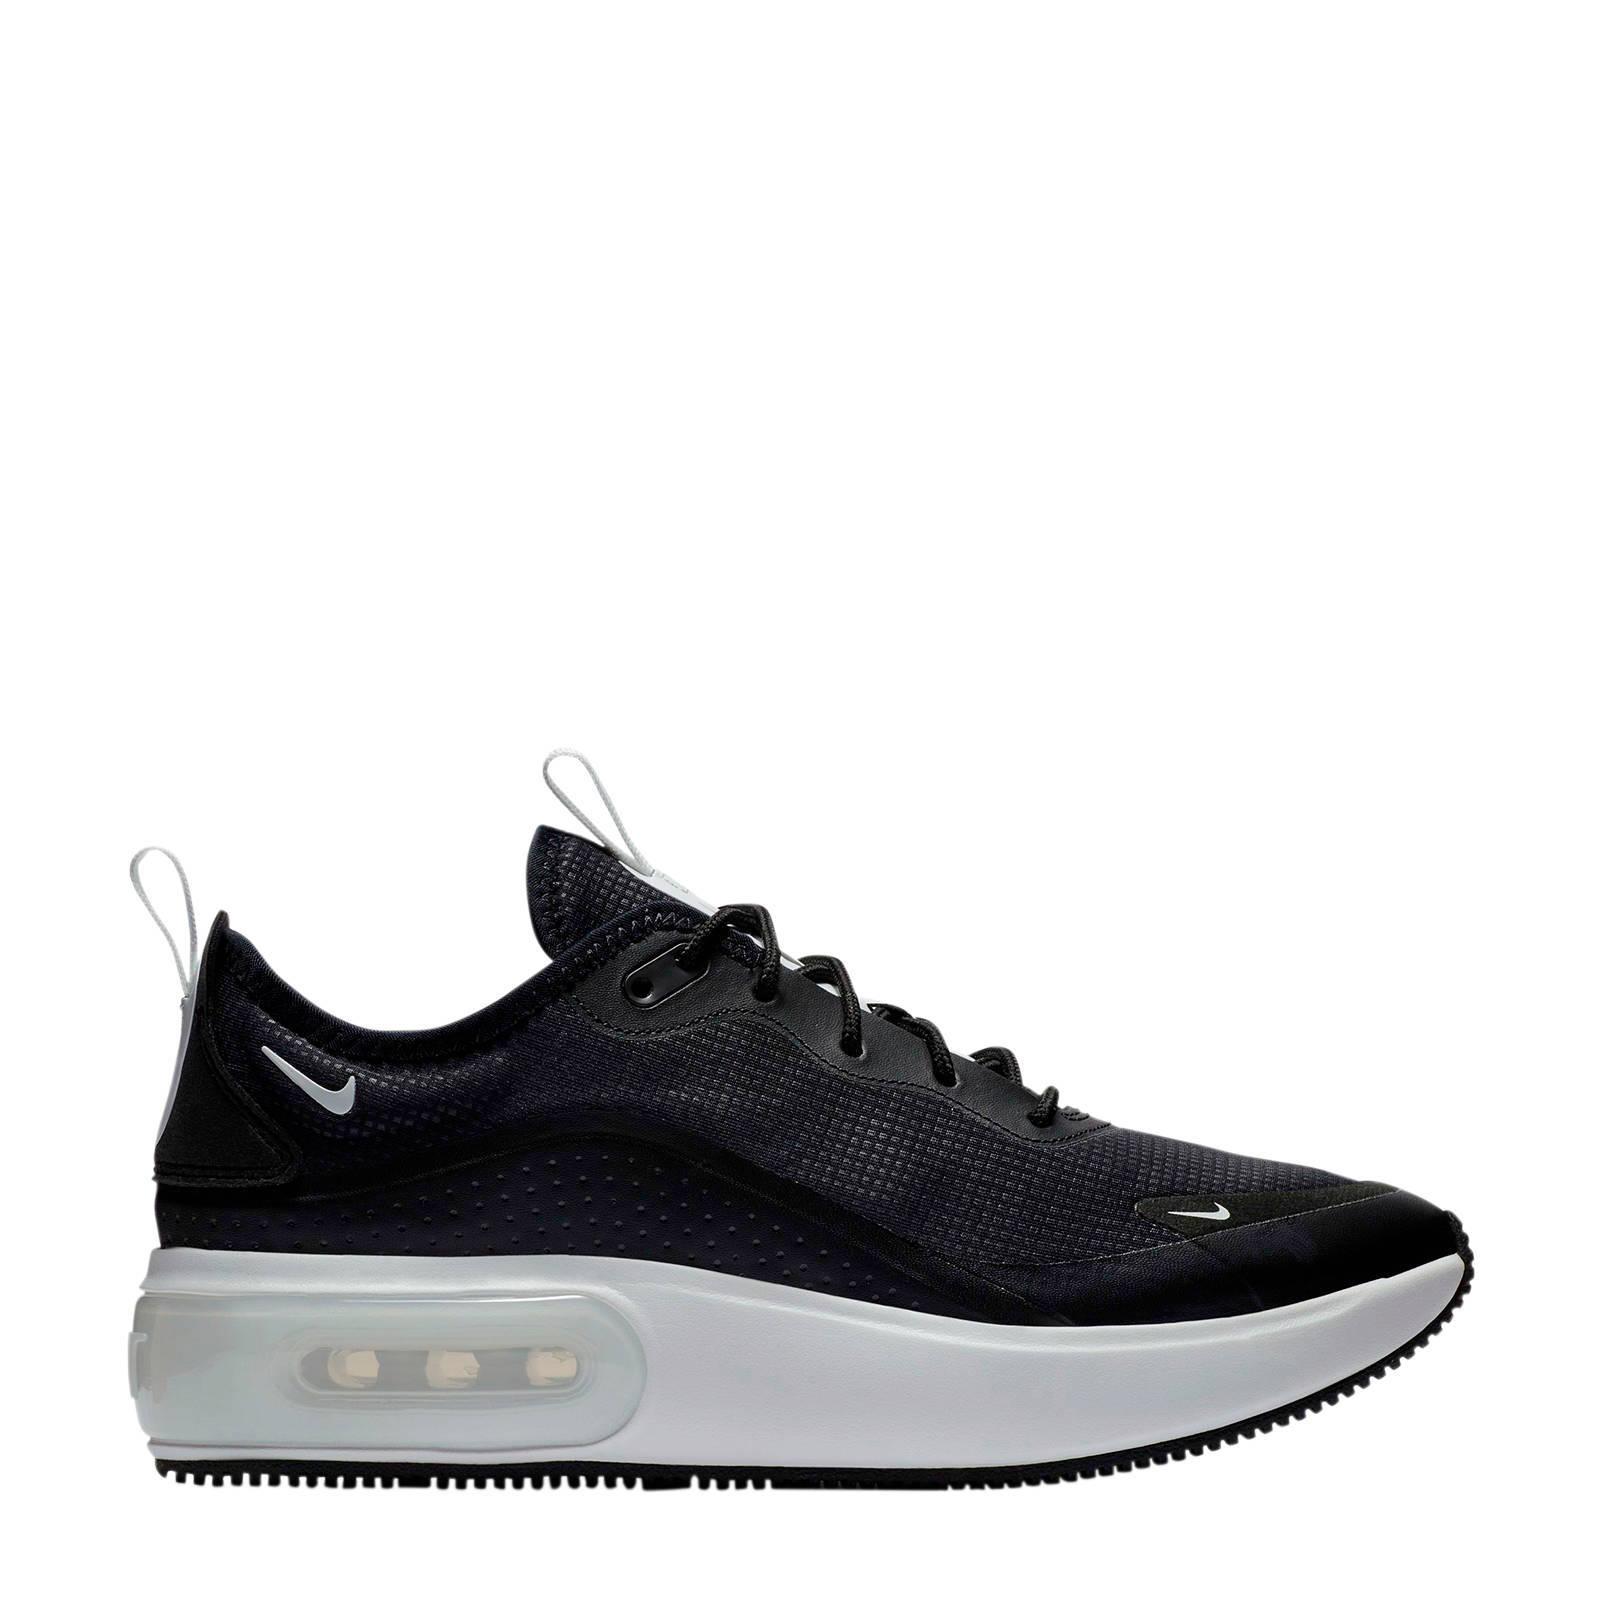 Nike dames sneakers bij wehkamp Gratis bezorging vanaf 20.